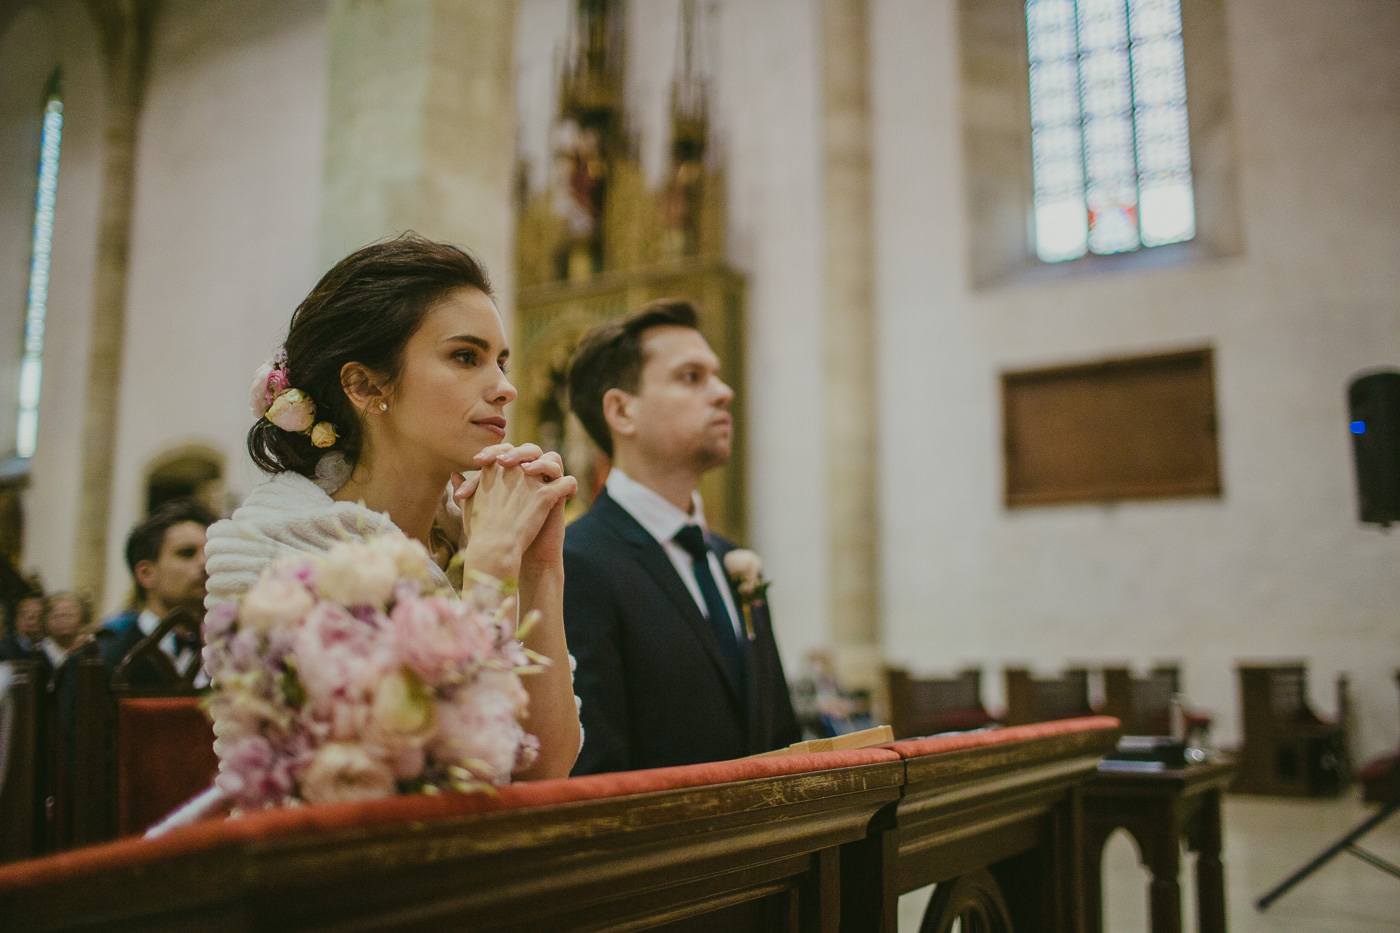 Svadba Bratislava wedding photography 00101